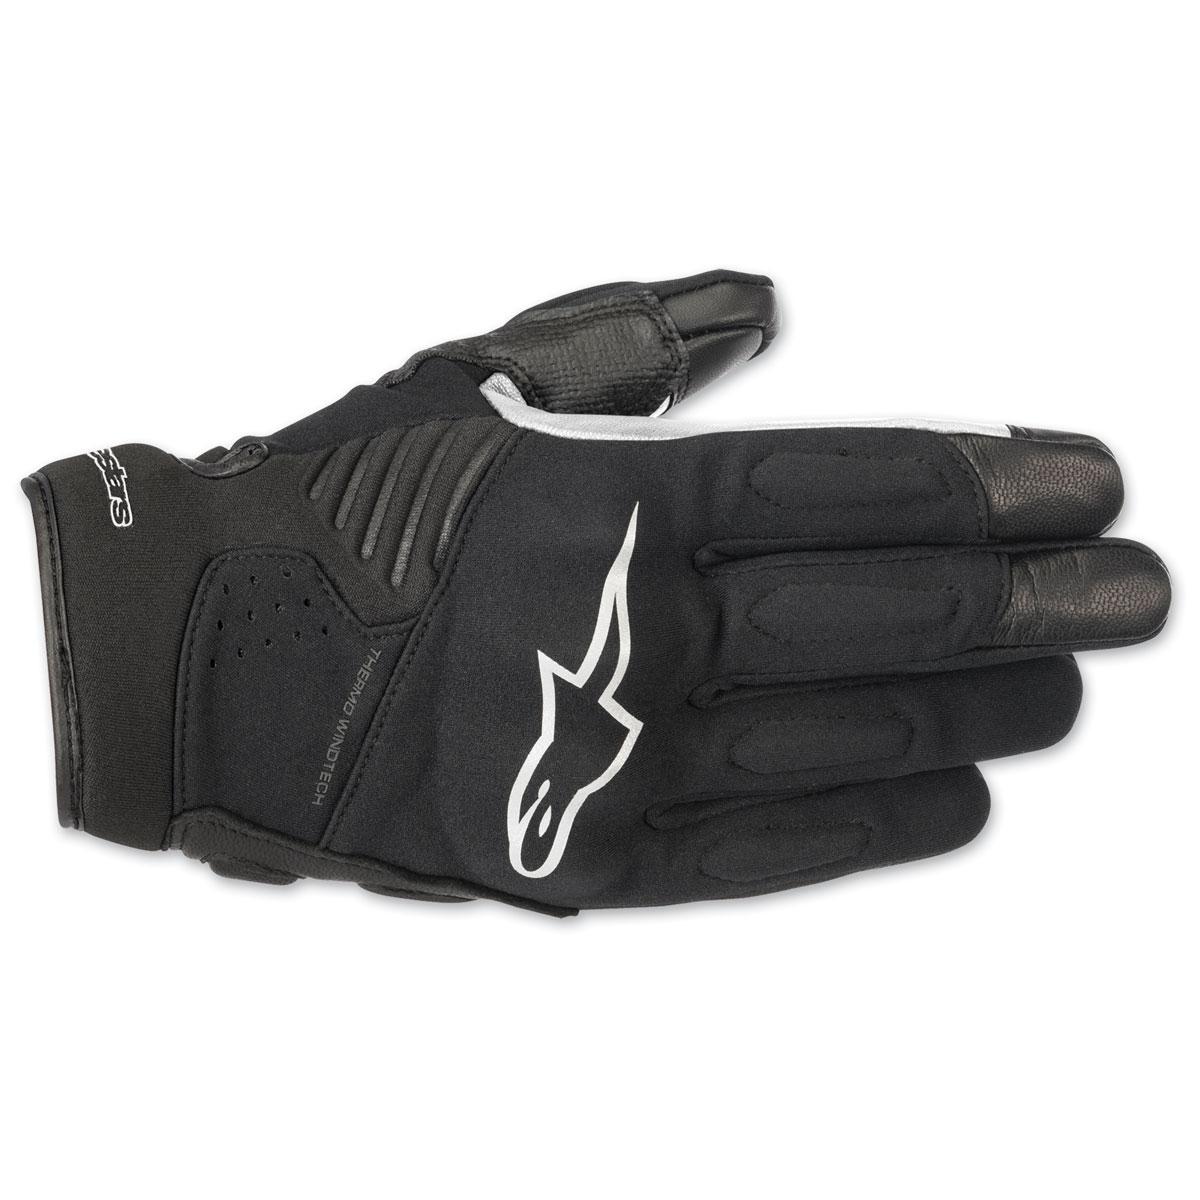 Alpinestars Men's Faster Black Gloves